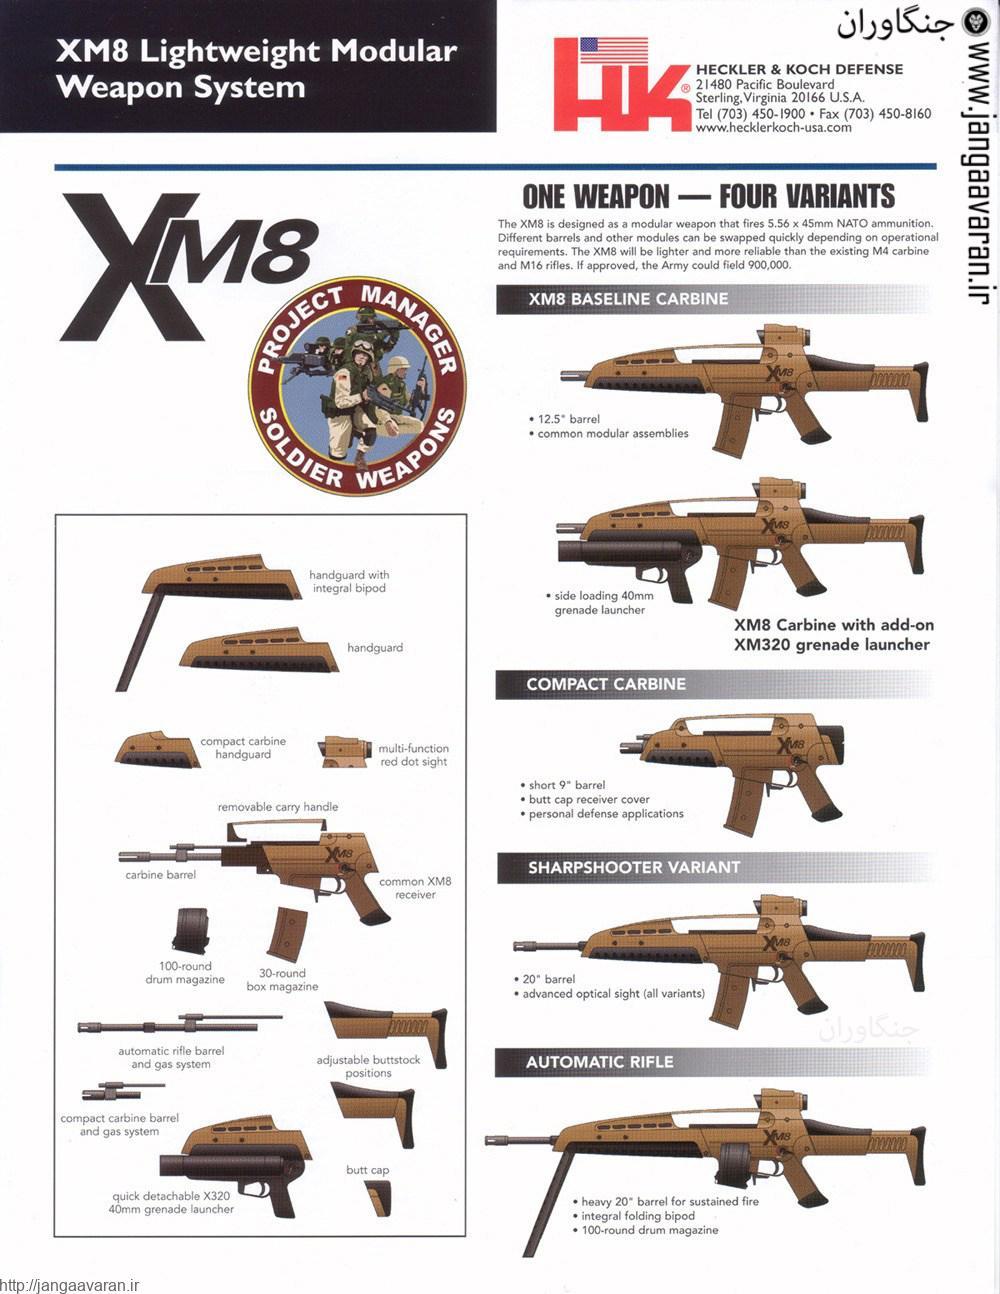 XM8 modularity